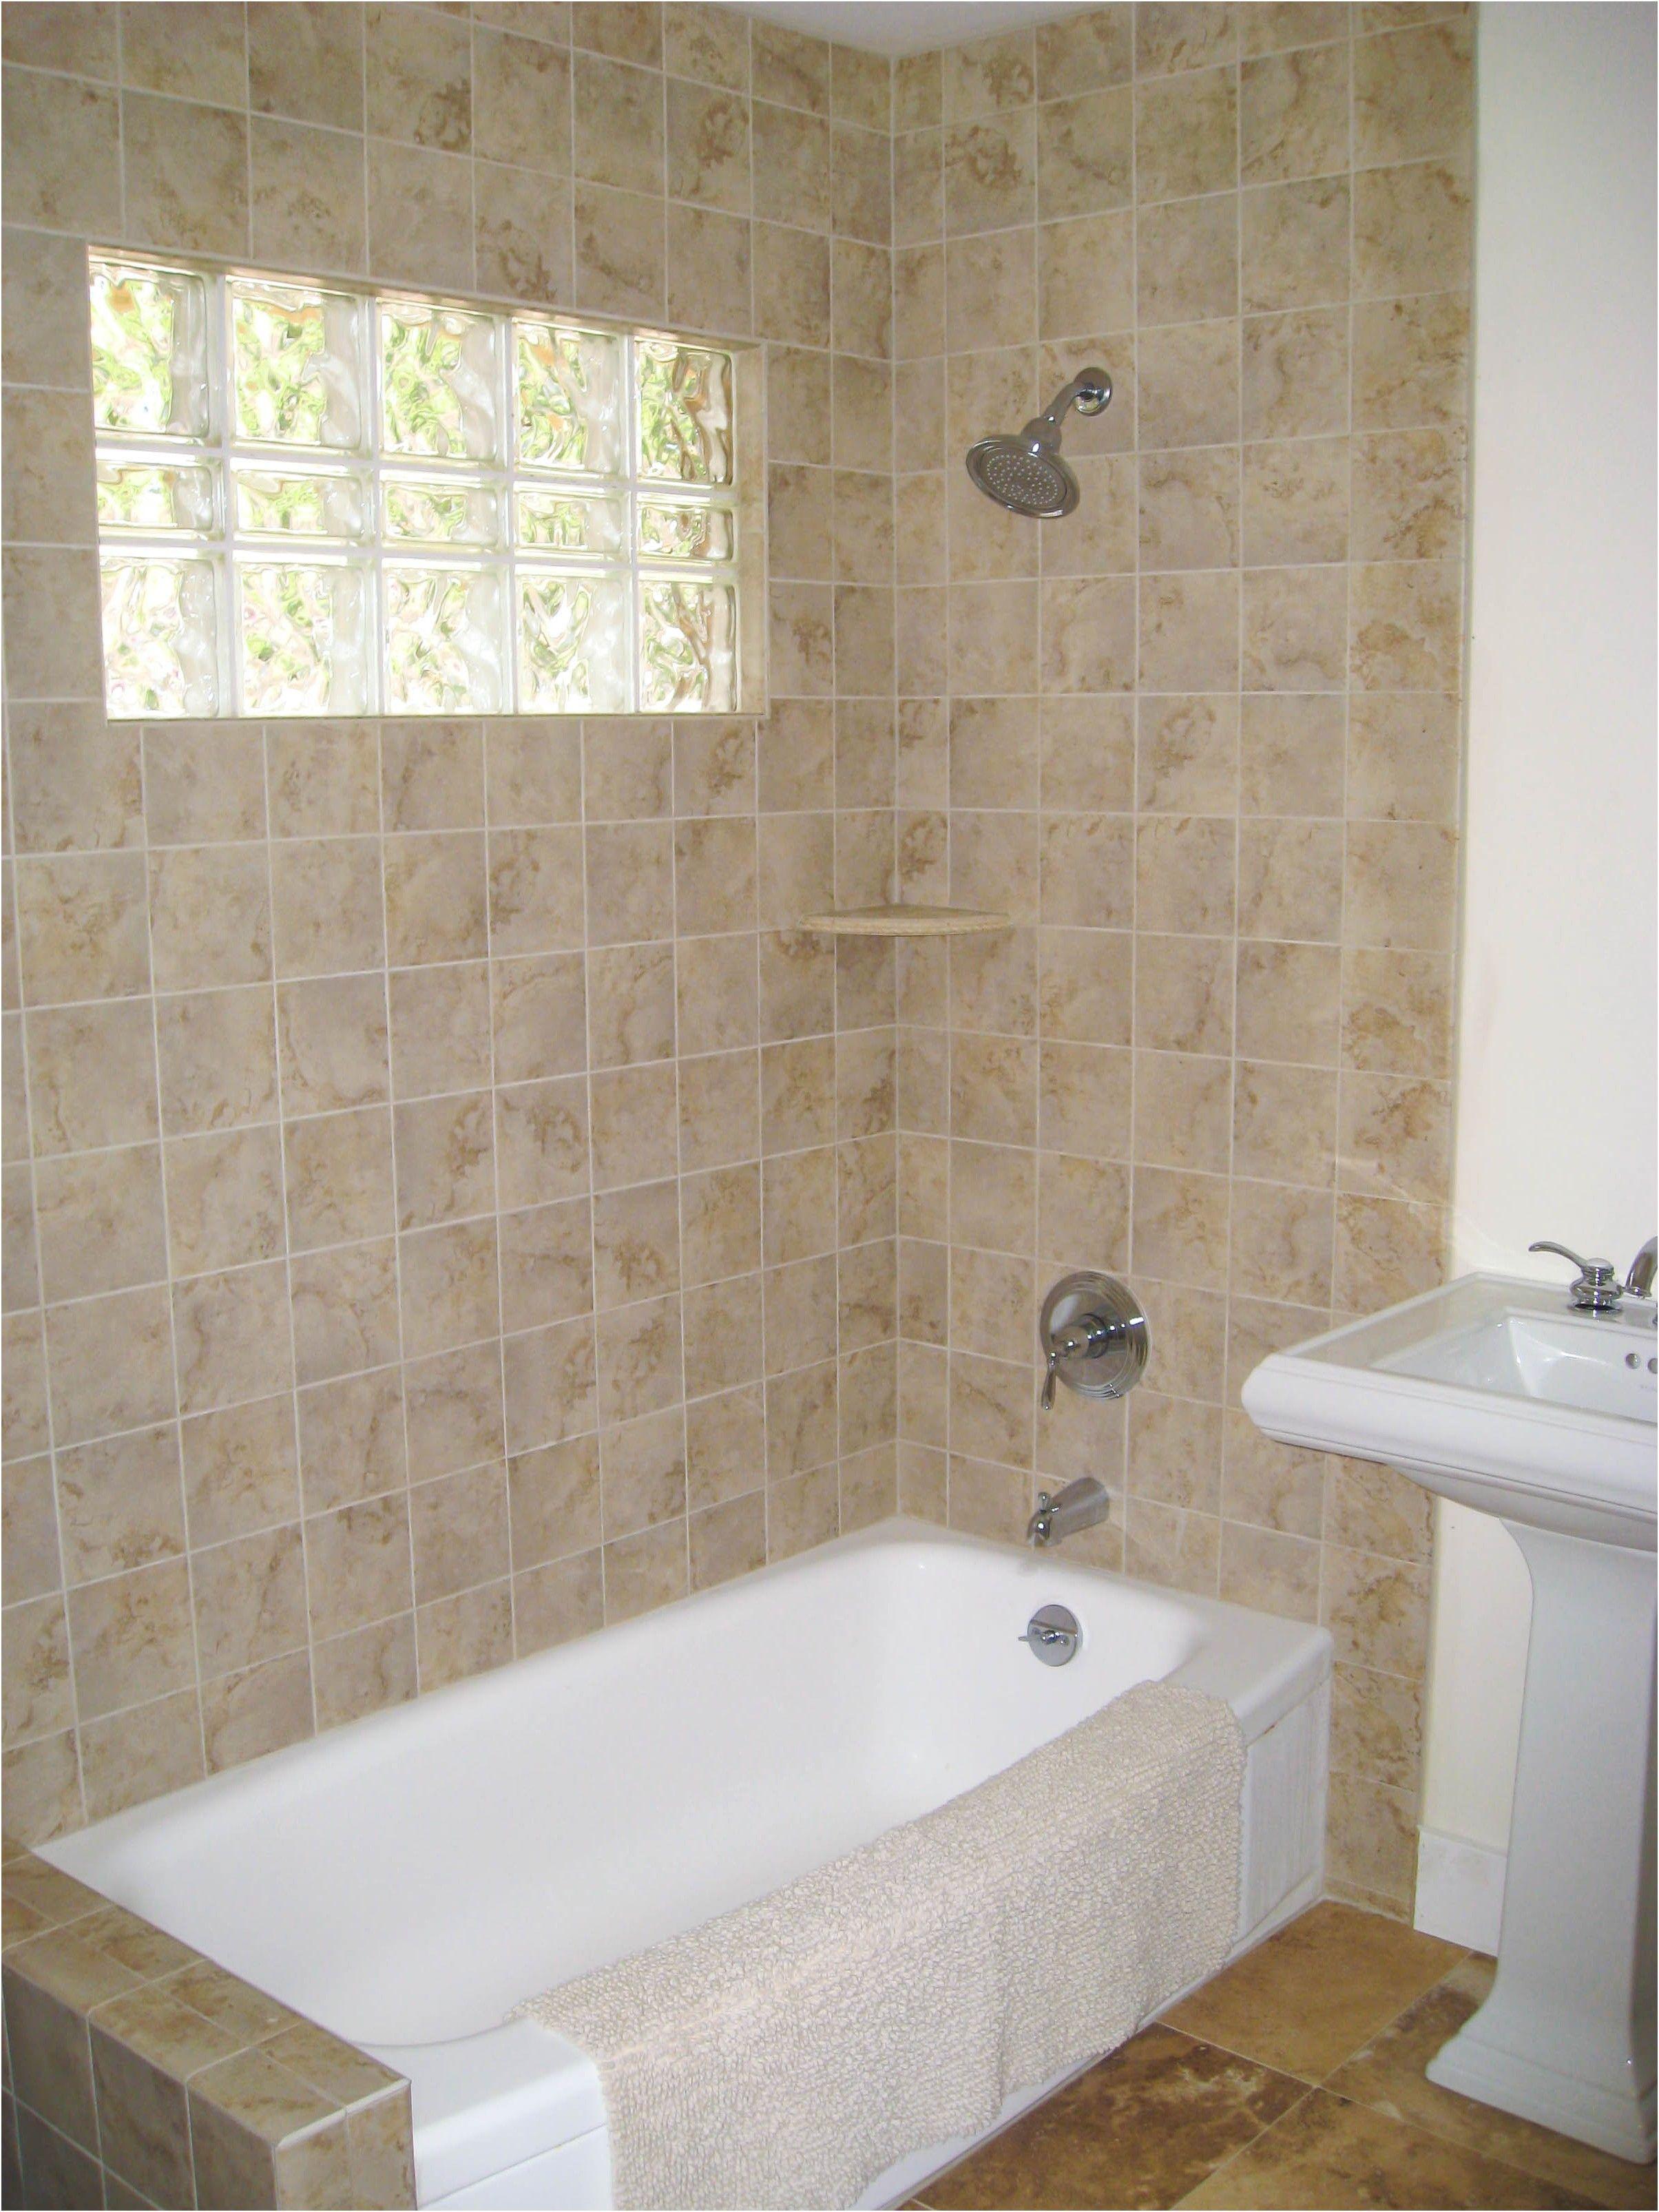 awesome Luxury Bathroom Surround Tile   mifd283.com   Pinterest ...